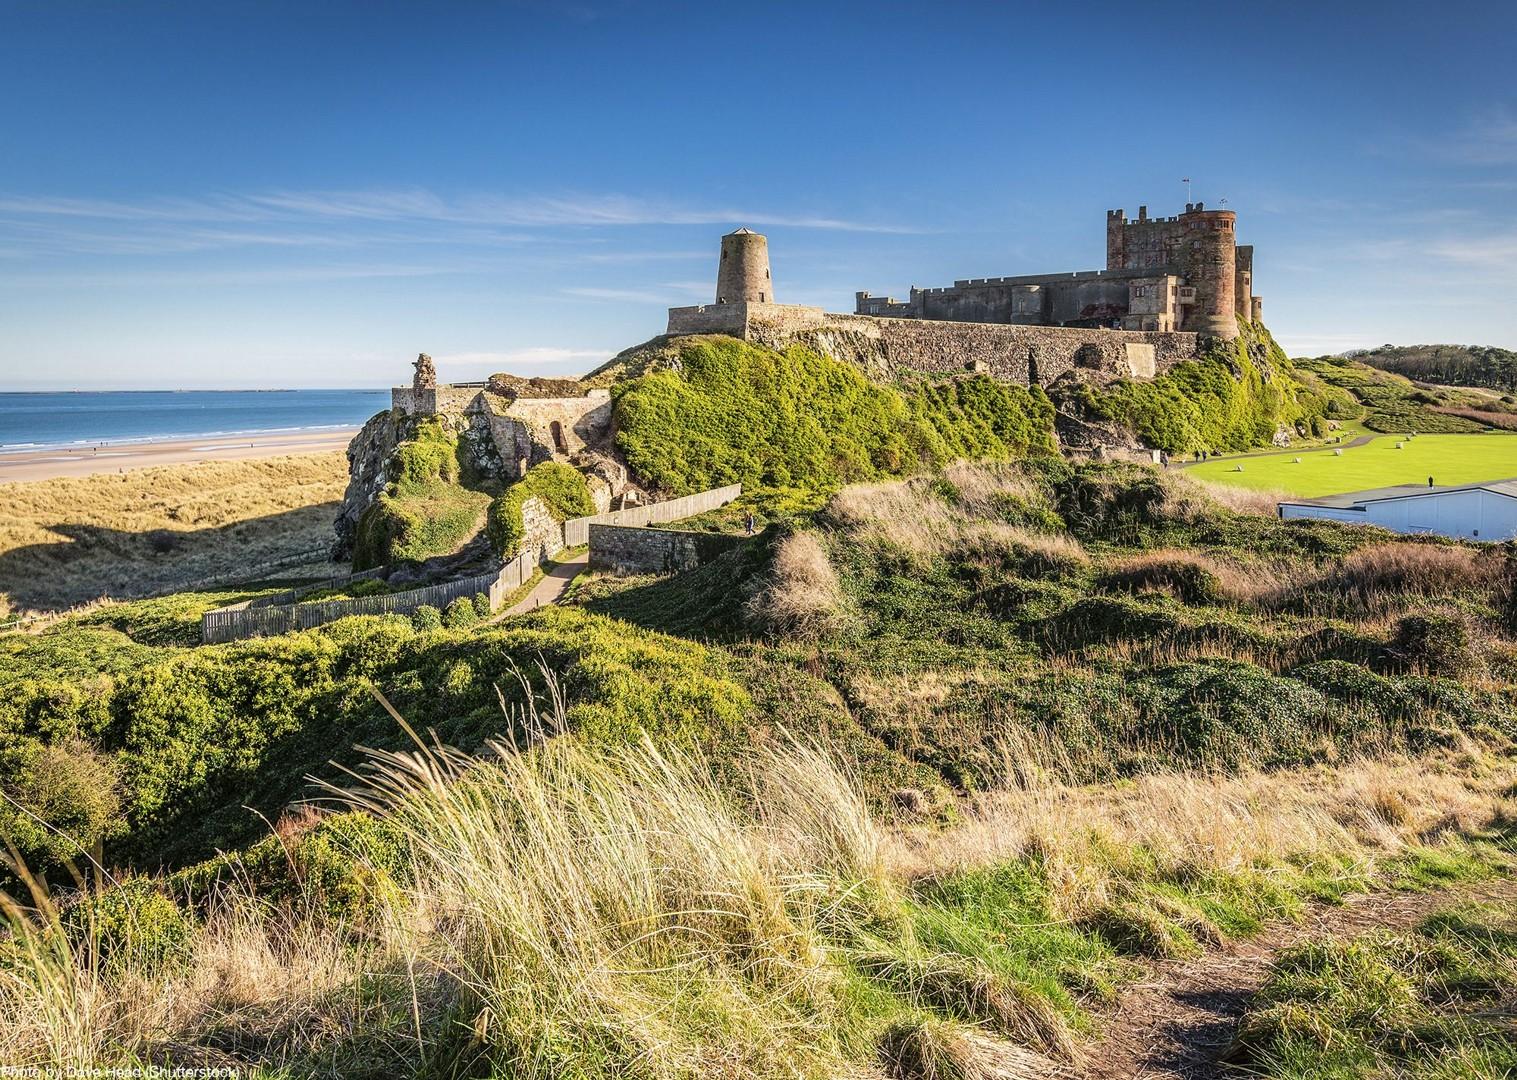 dunstanburgh-bamburgh-castle-coast-uk-england-self-guided-cycling.jpg - UK - Northumberland - Alnmouth - Self-Guided Leisure Cycling Holiday - Leisure Cycling